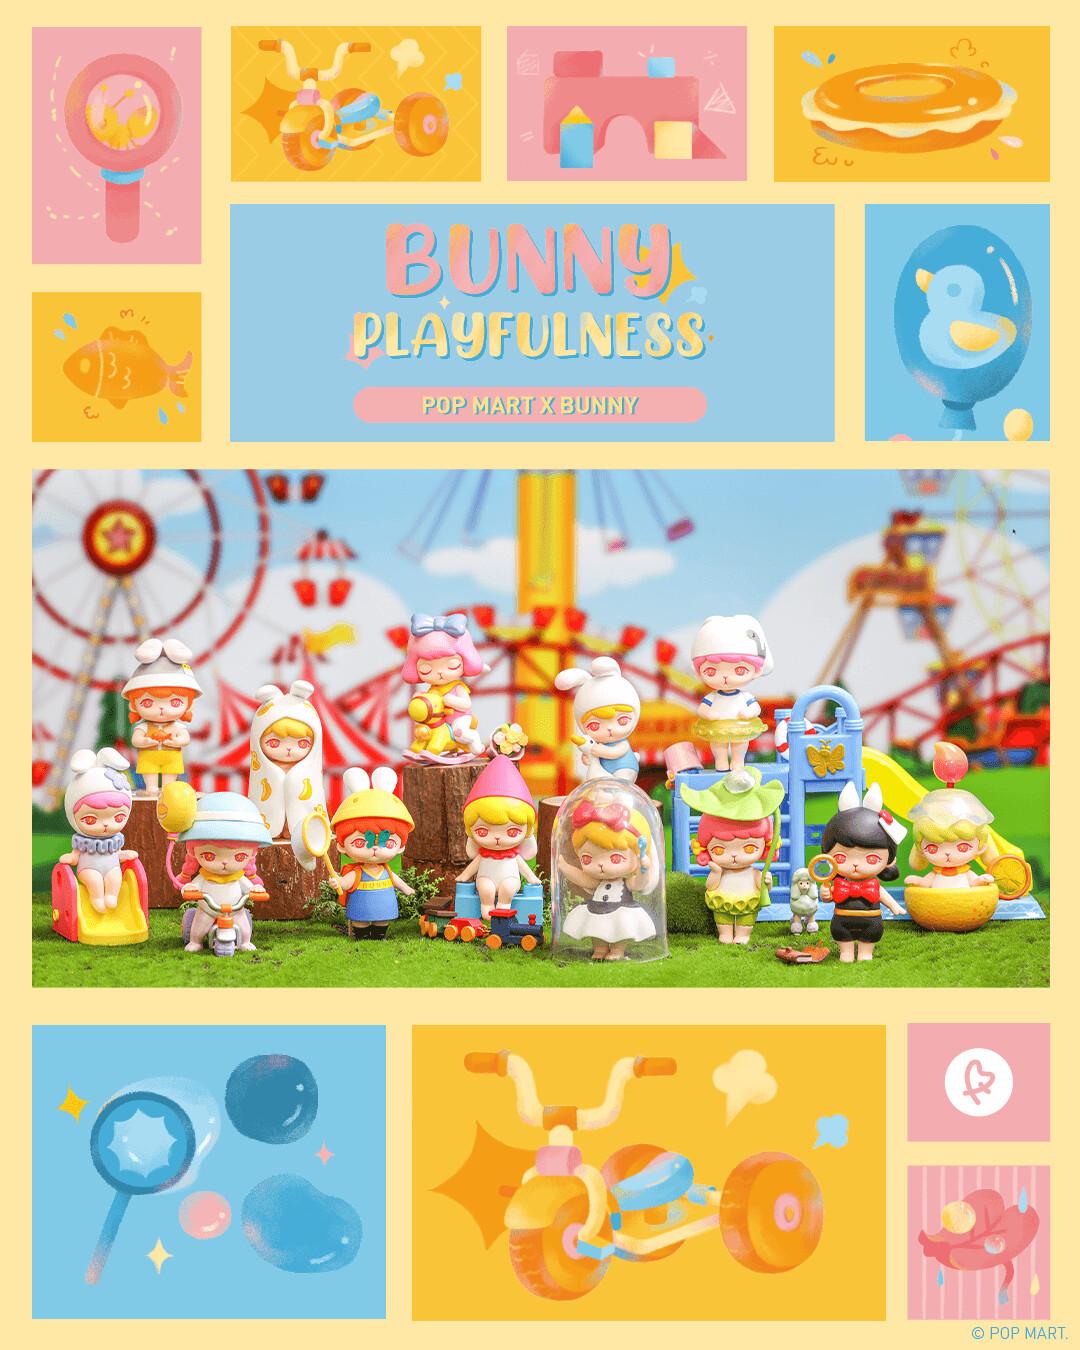 PRE-ORDER Pop Mart Bunny Playfulness Blind Box of 12